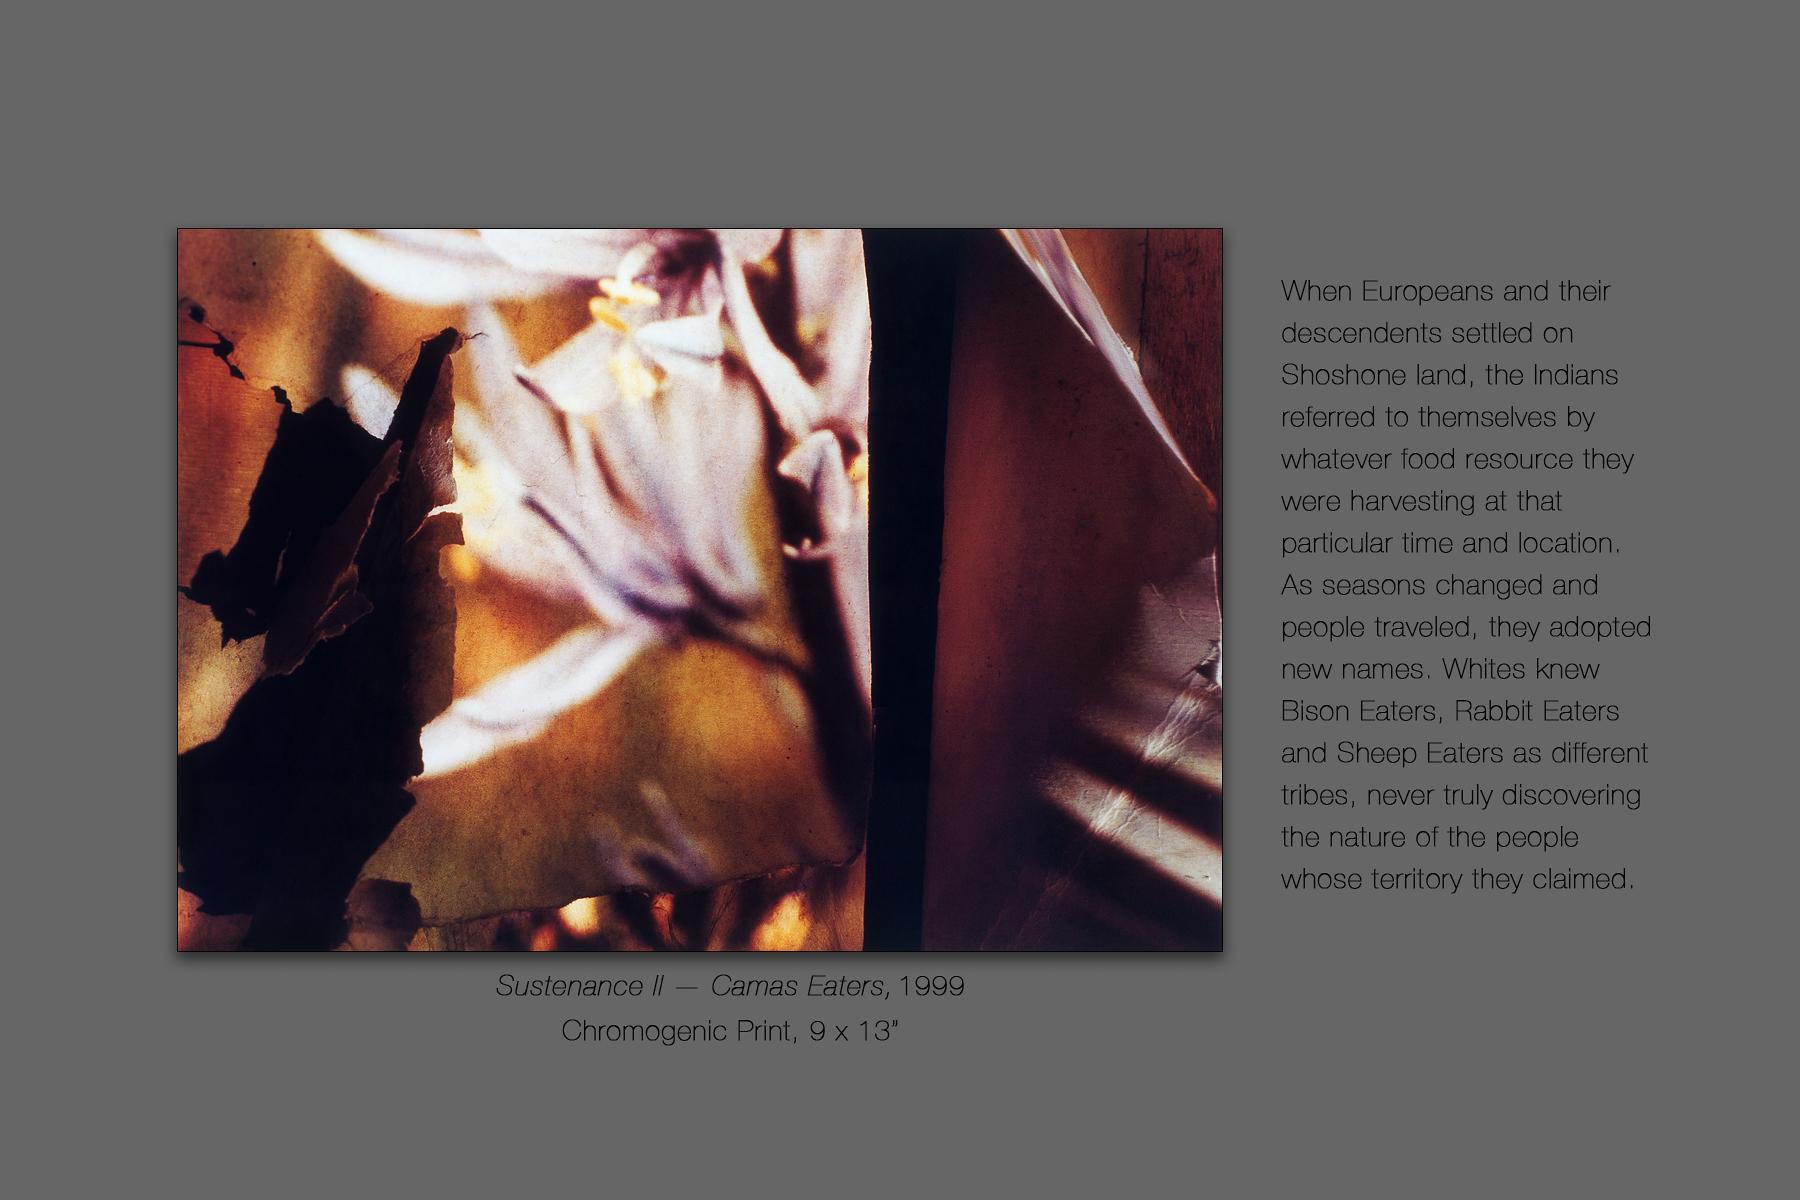 Sustenance II — Camas Eaters, 1999